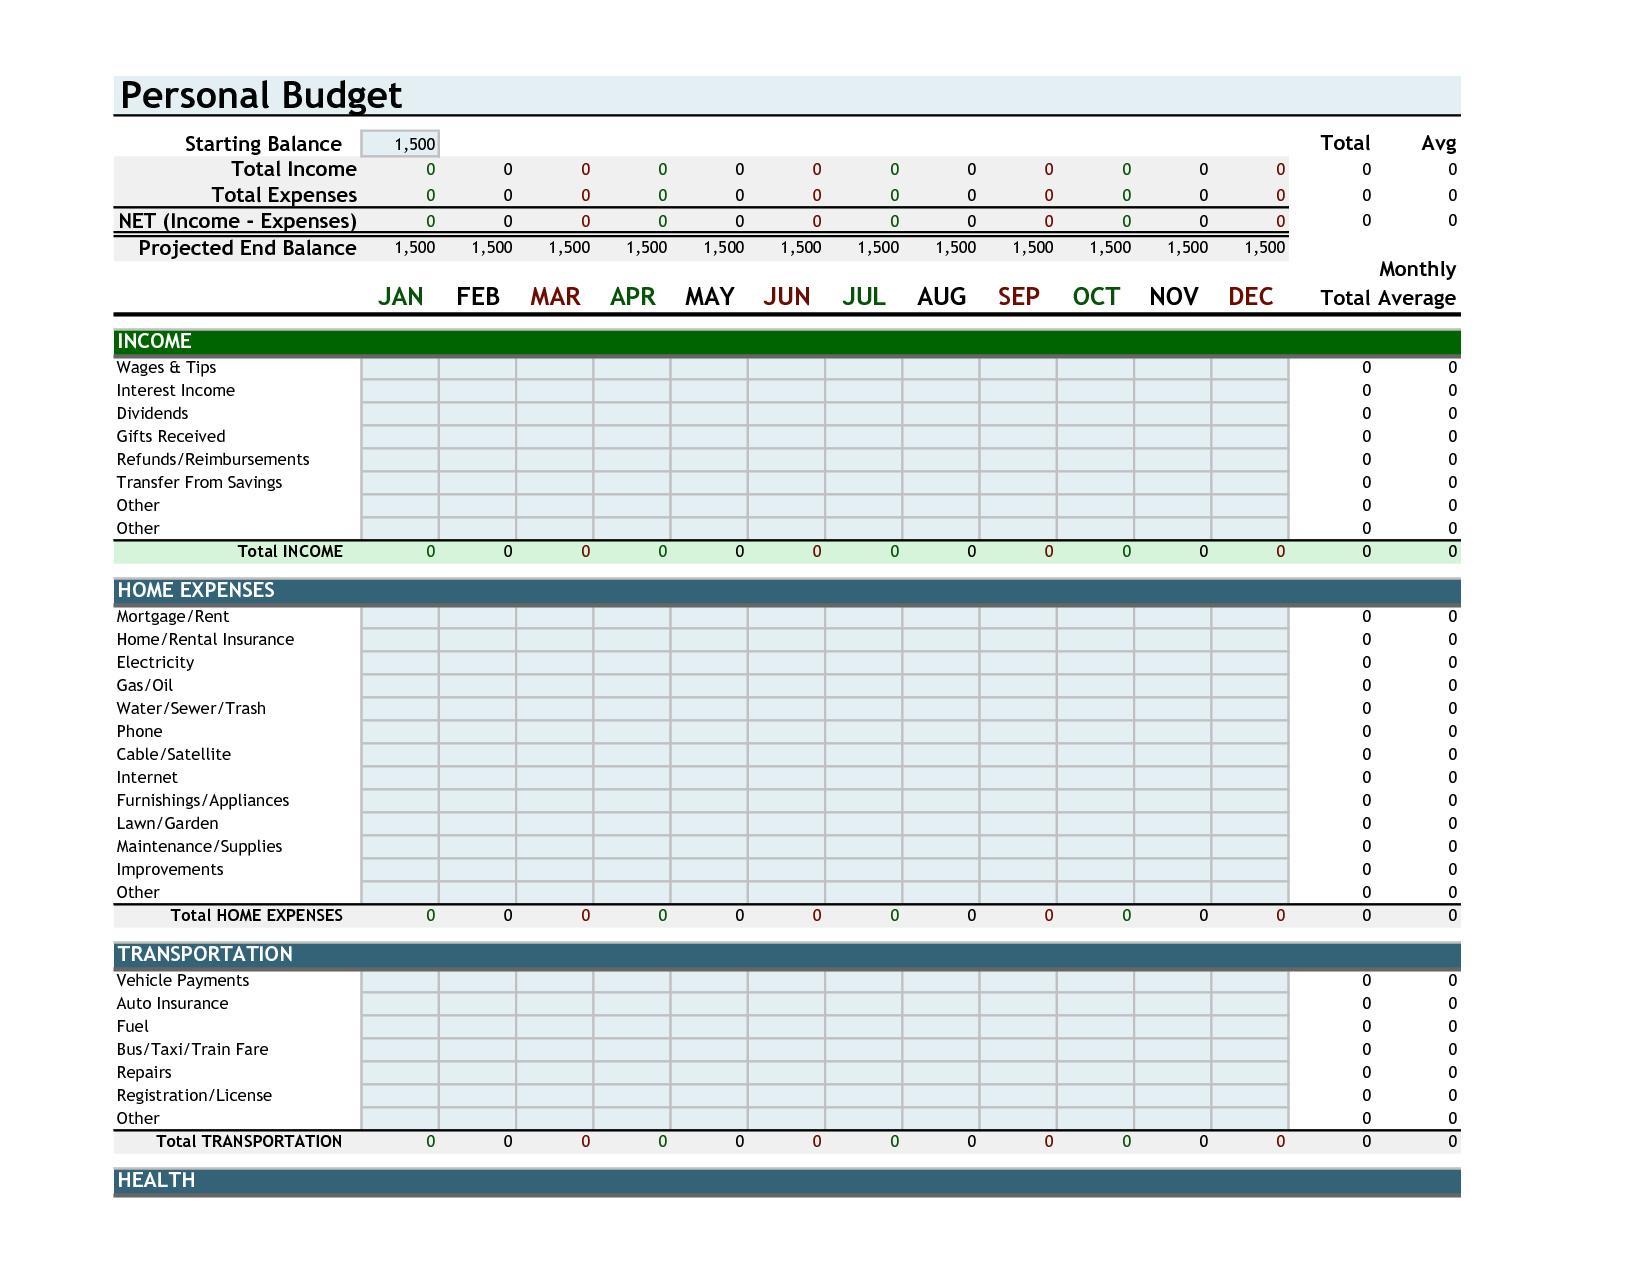 Budget Forecast Excel Spreadsheet Spreadsheet Downloa Budget Forecast Excel Spreadsheet